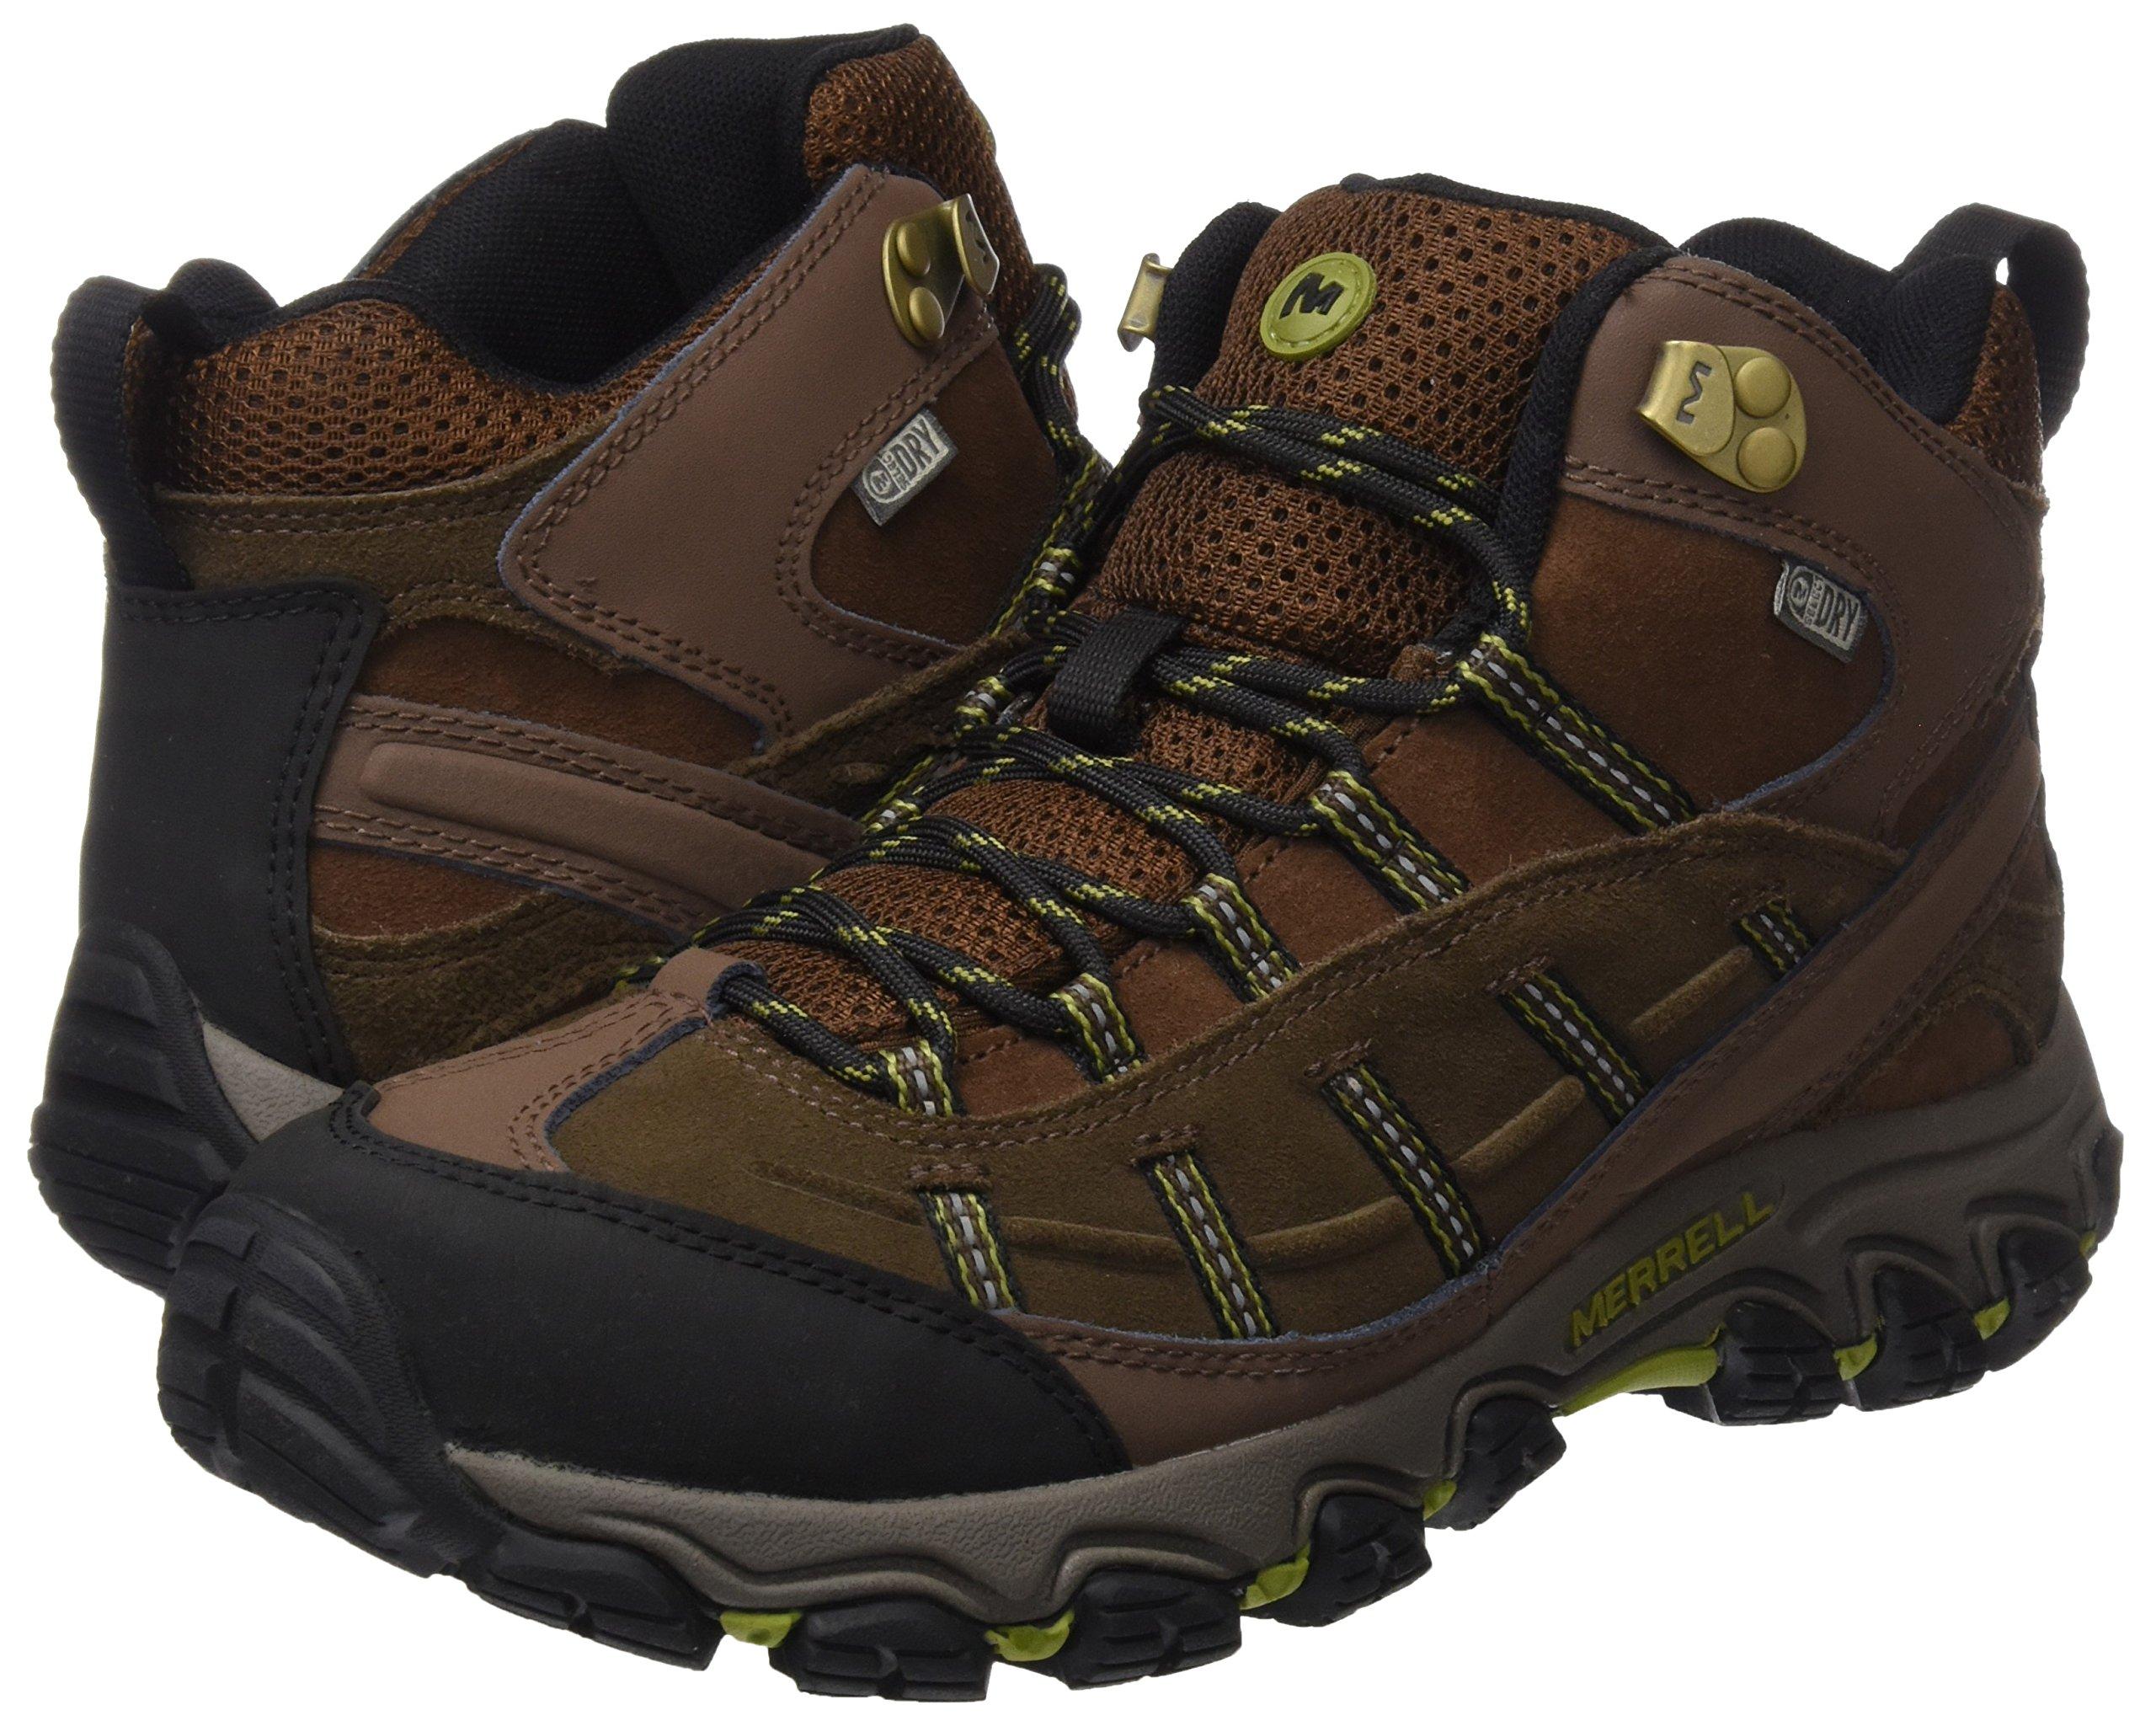 919bRHZLznL - Merrell Men's Terramorph Mid Waterproof High Rise Hiking Boots